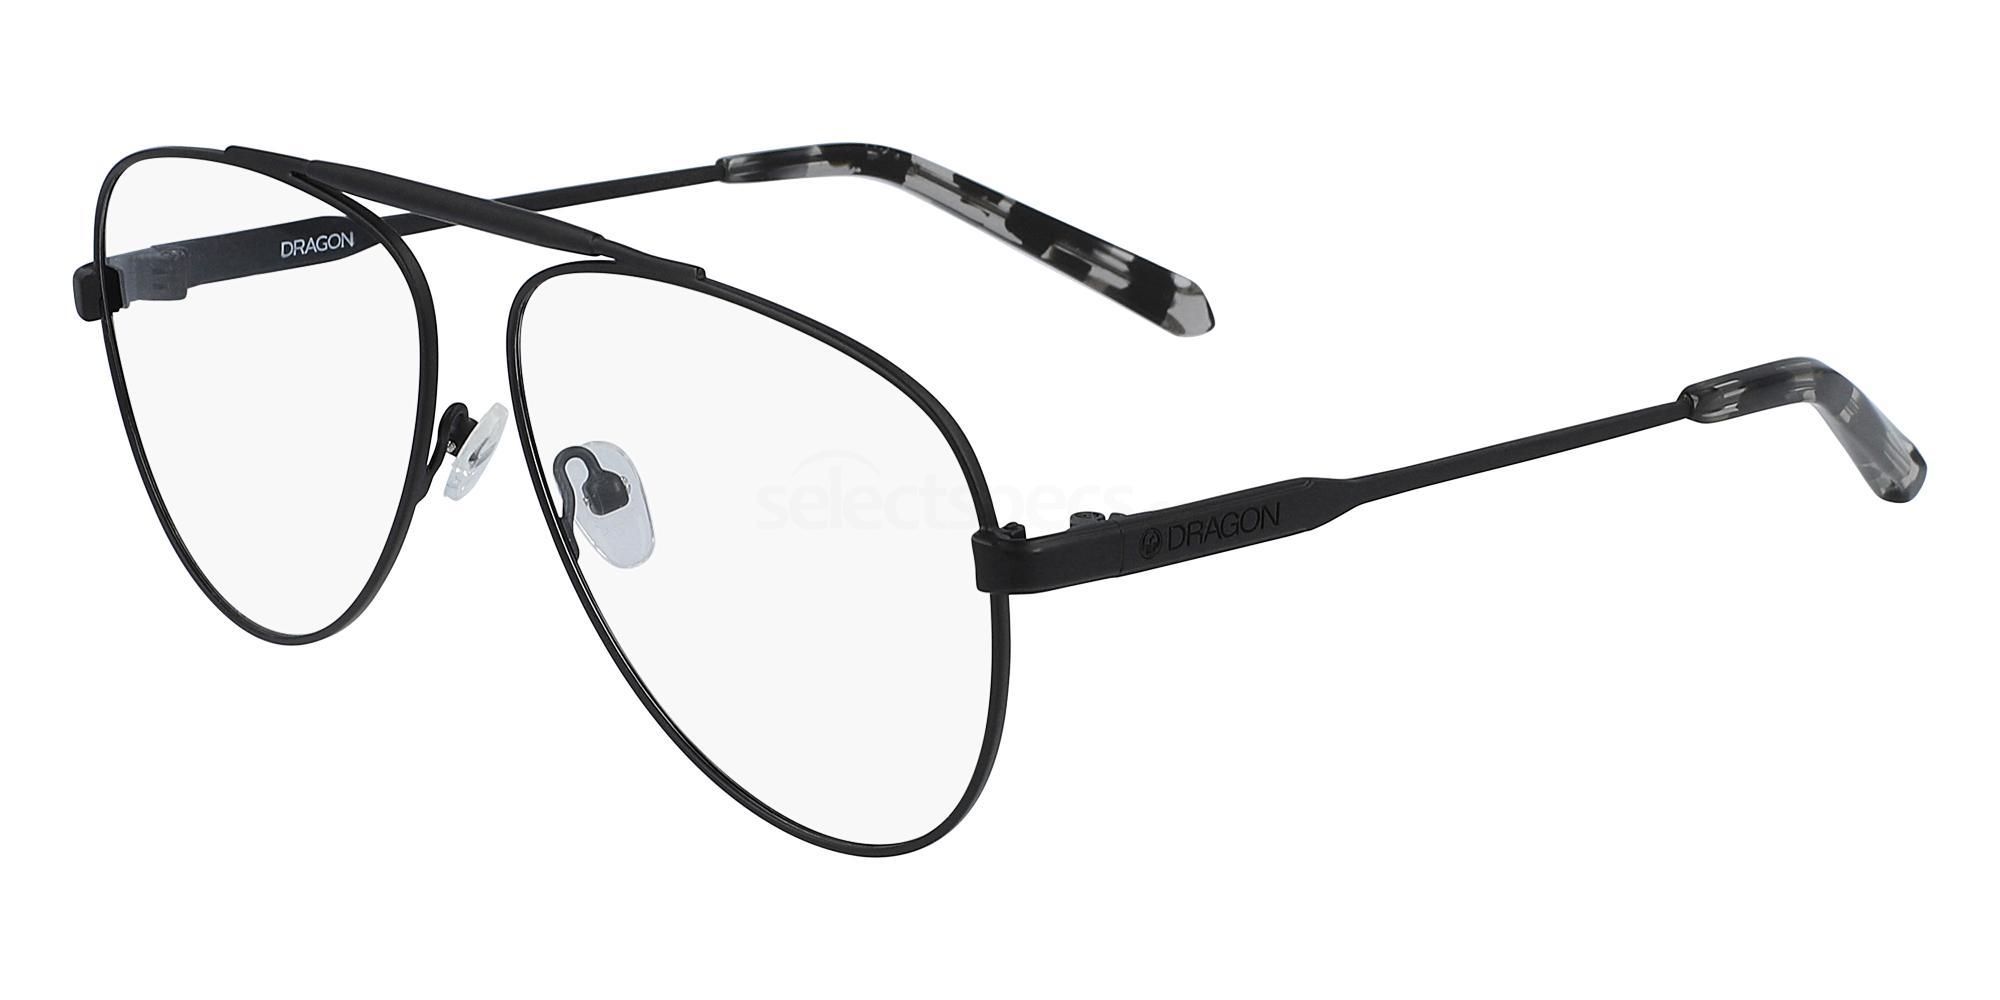 002 DR197 DEE Glasses, Dragon